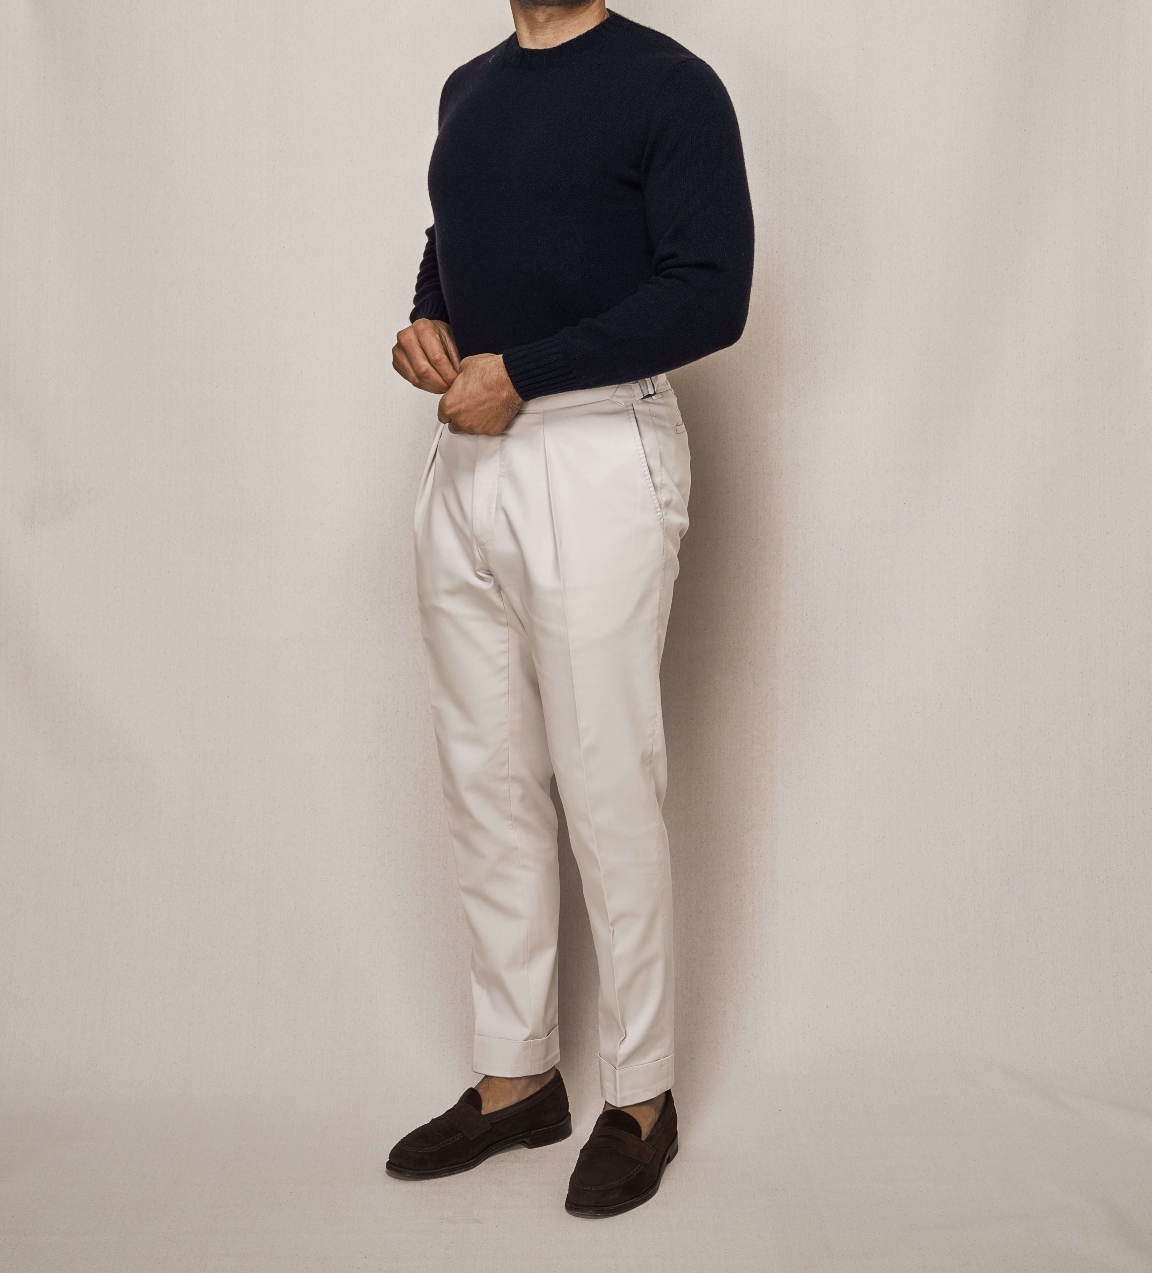 Navy Cashmere Knit Crew Neck   Cotton Stretch Trouser